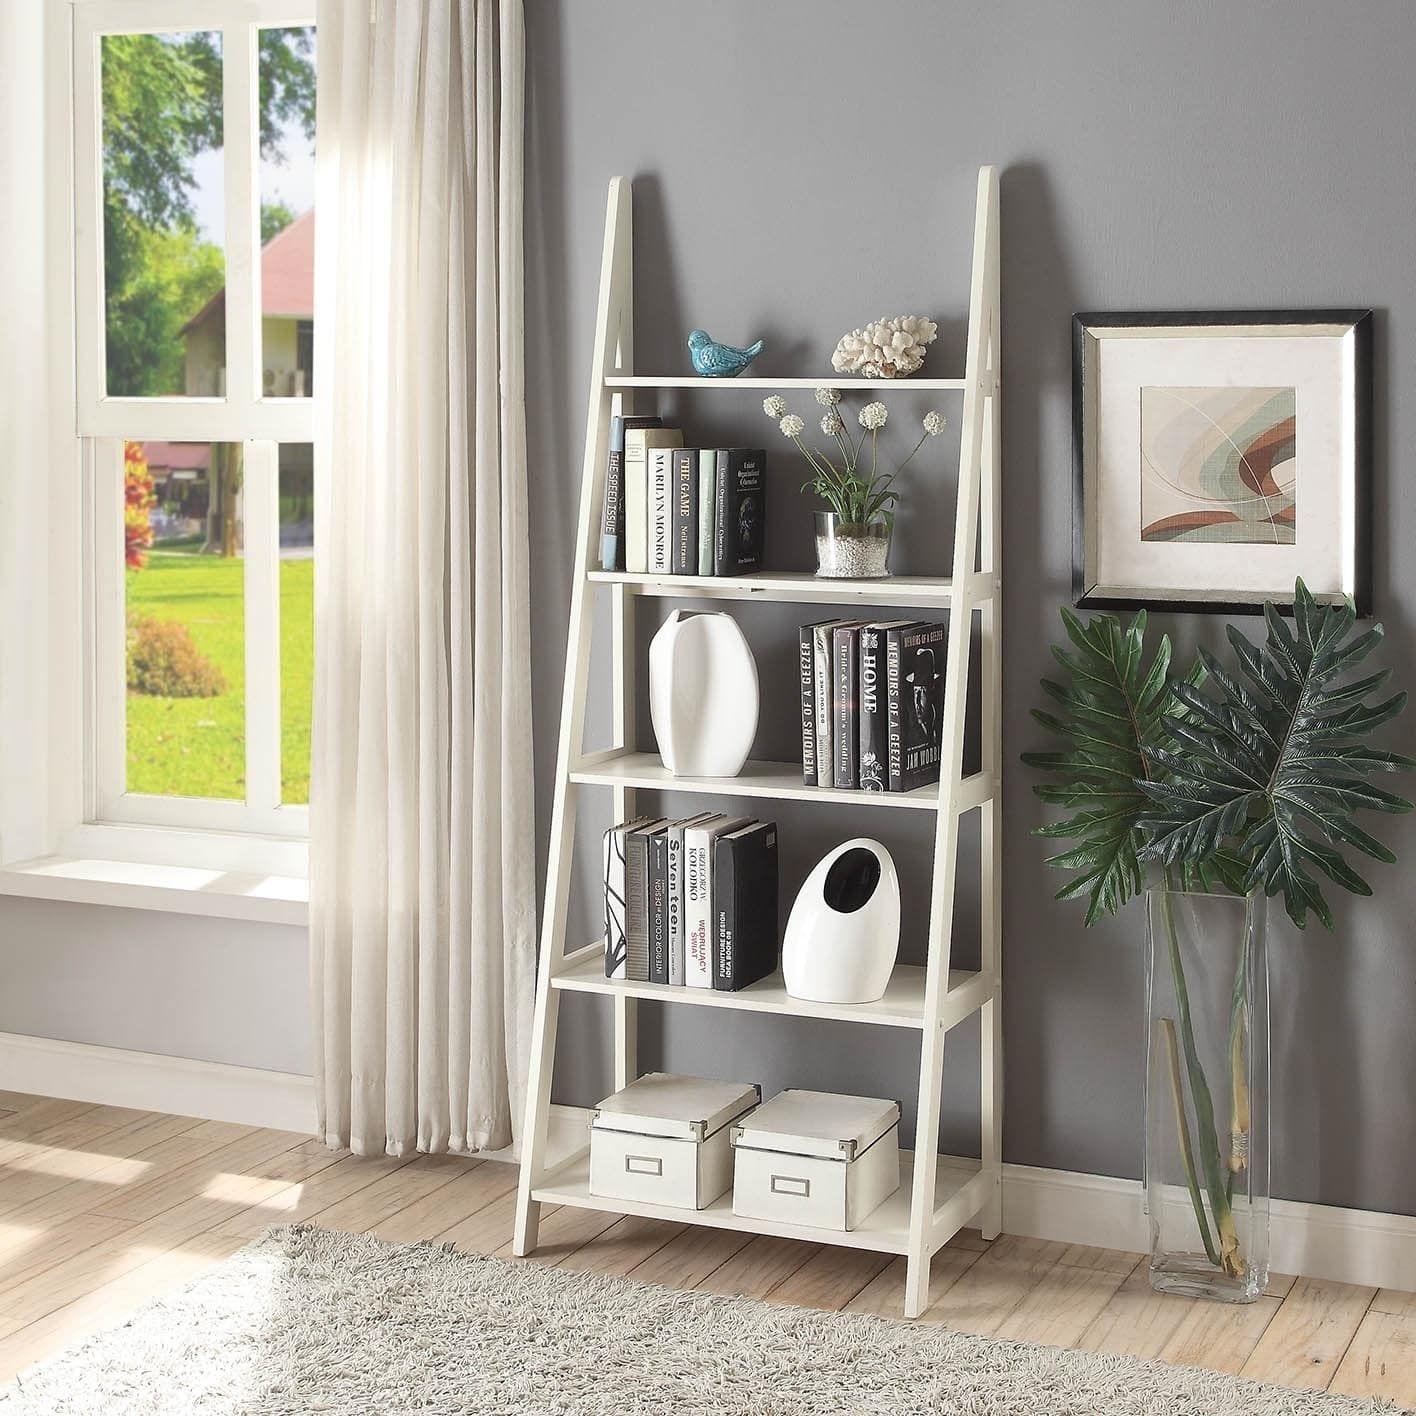 Briarwood Home Decor Espresso Colored Wood 28x72 Ladder Style Bookcase White